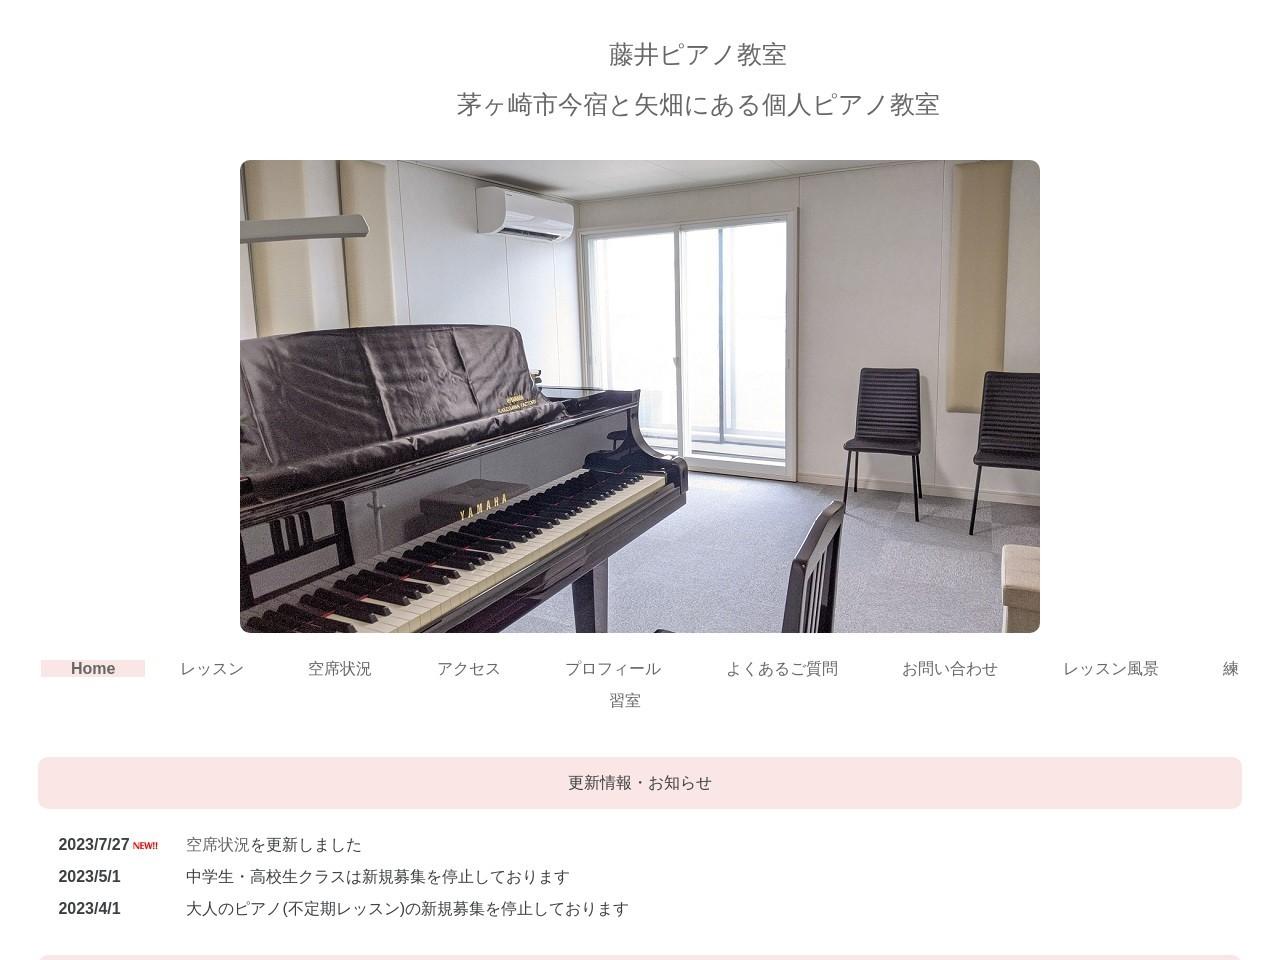 FuG Klavierklasseのサムネイル